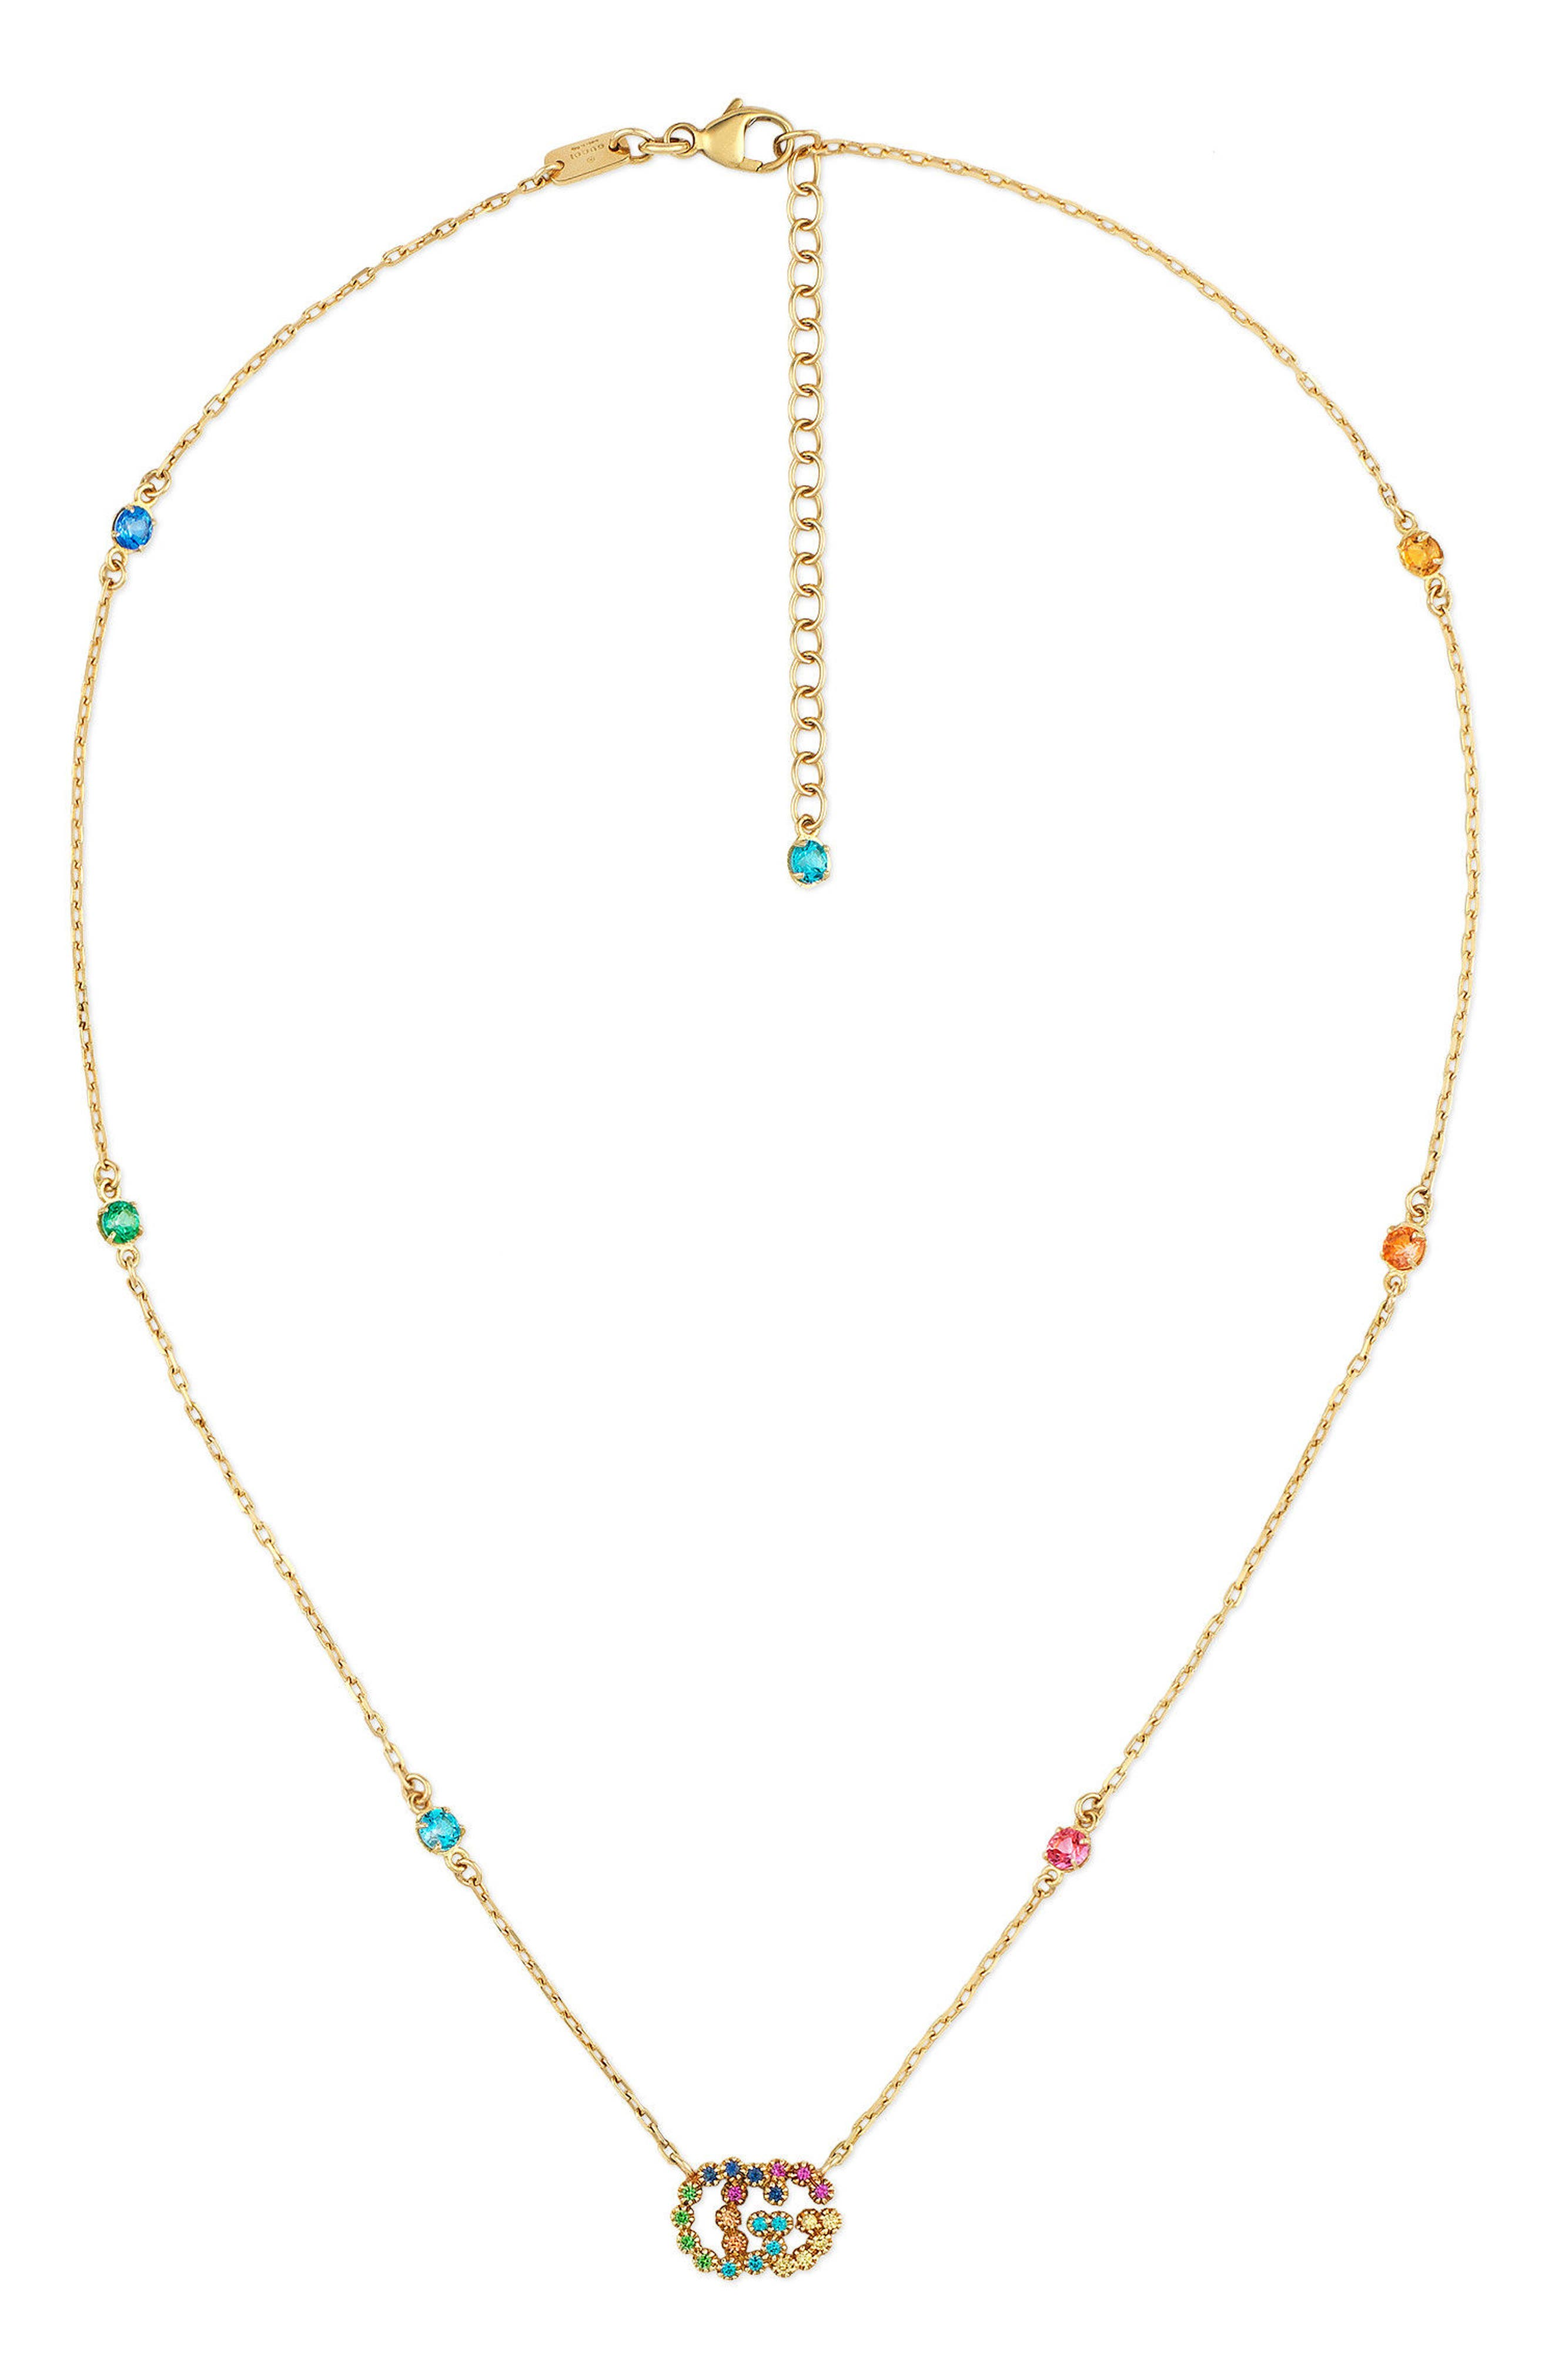 Main Image - Gucci Running G Semiprecius Stone Pendant Necklace